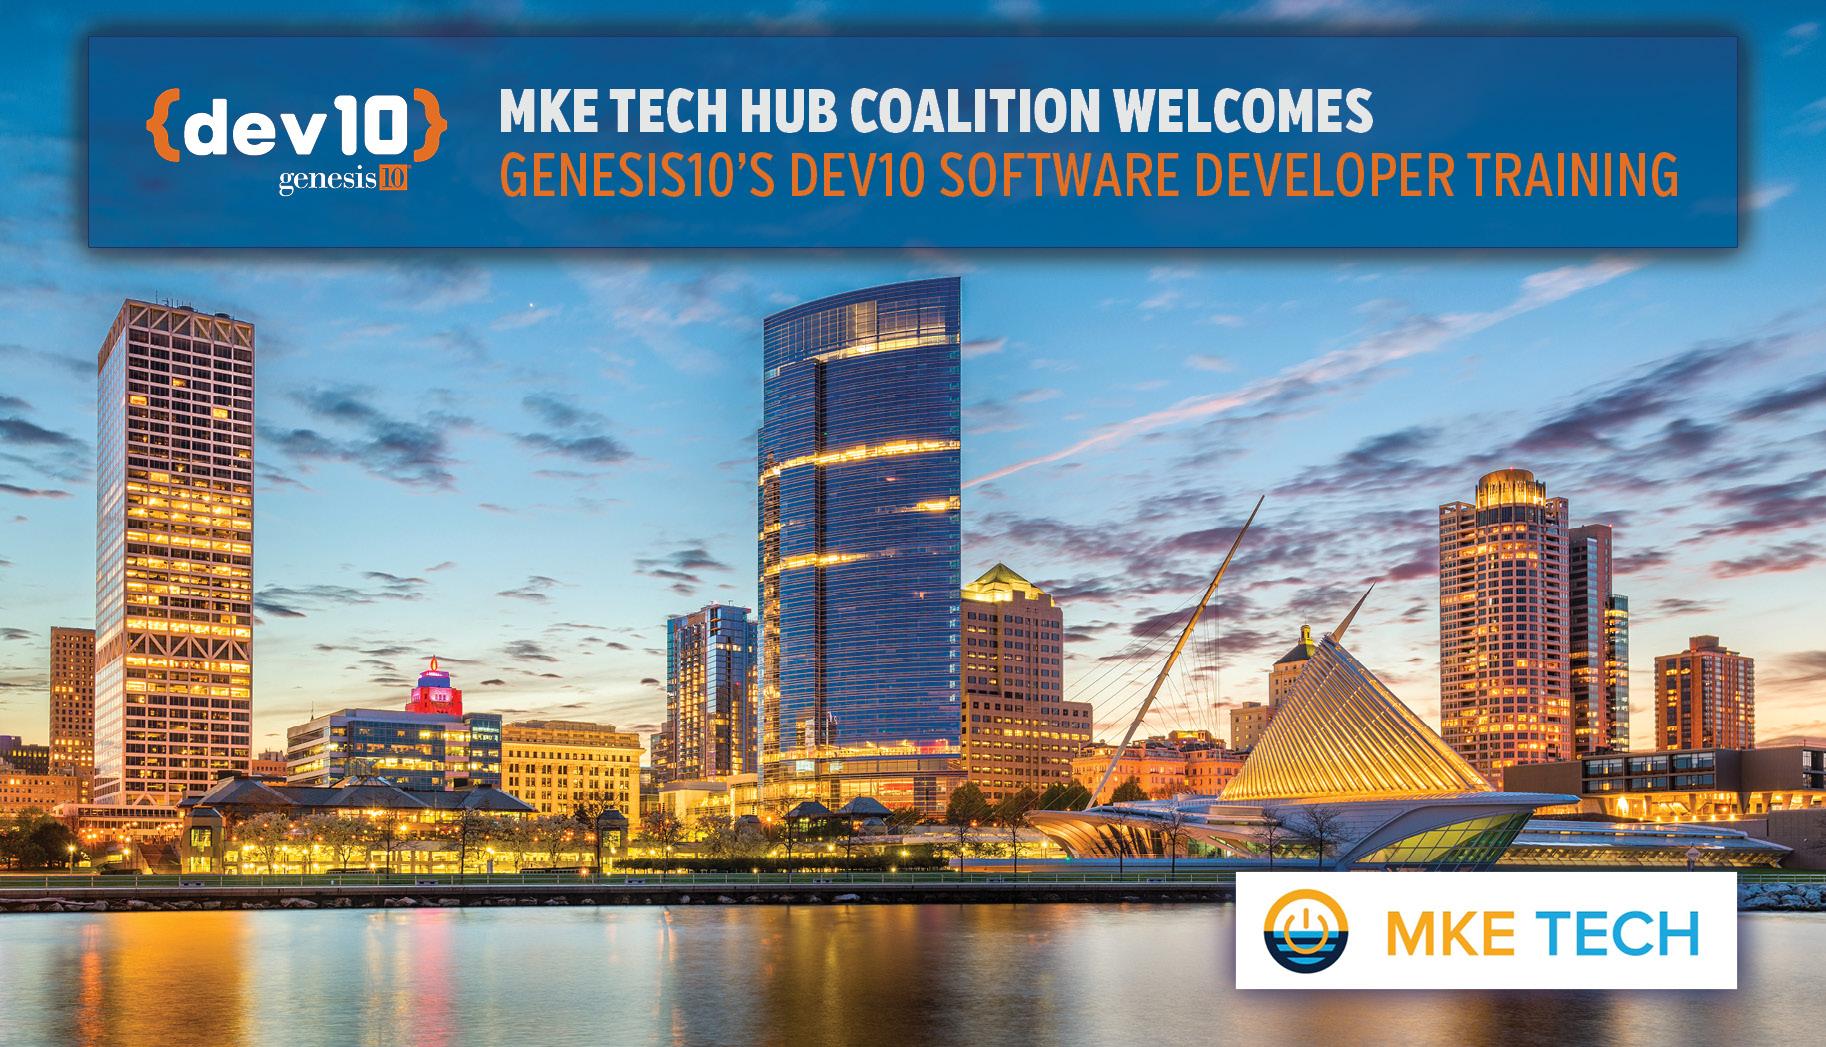 2020-Milwaukee Dev10 program